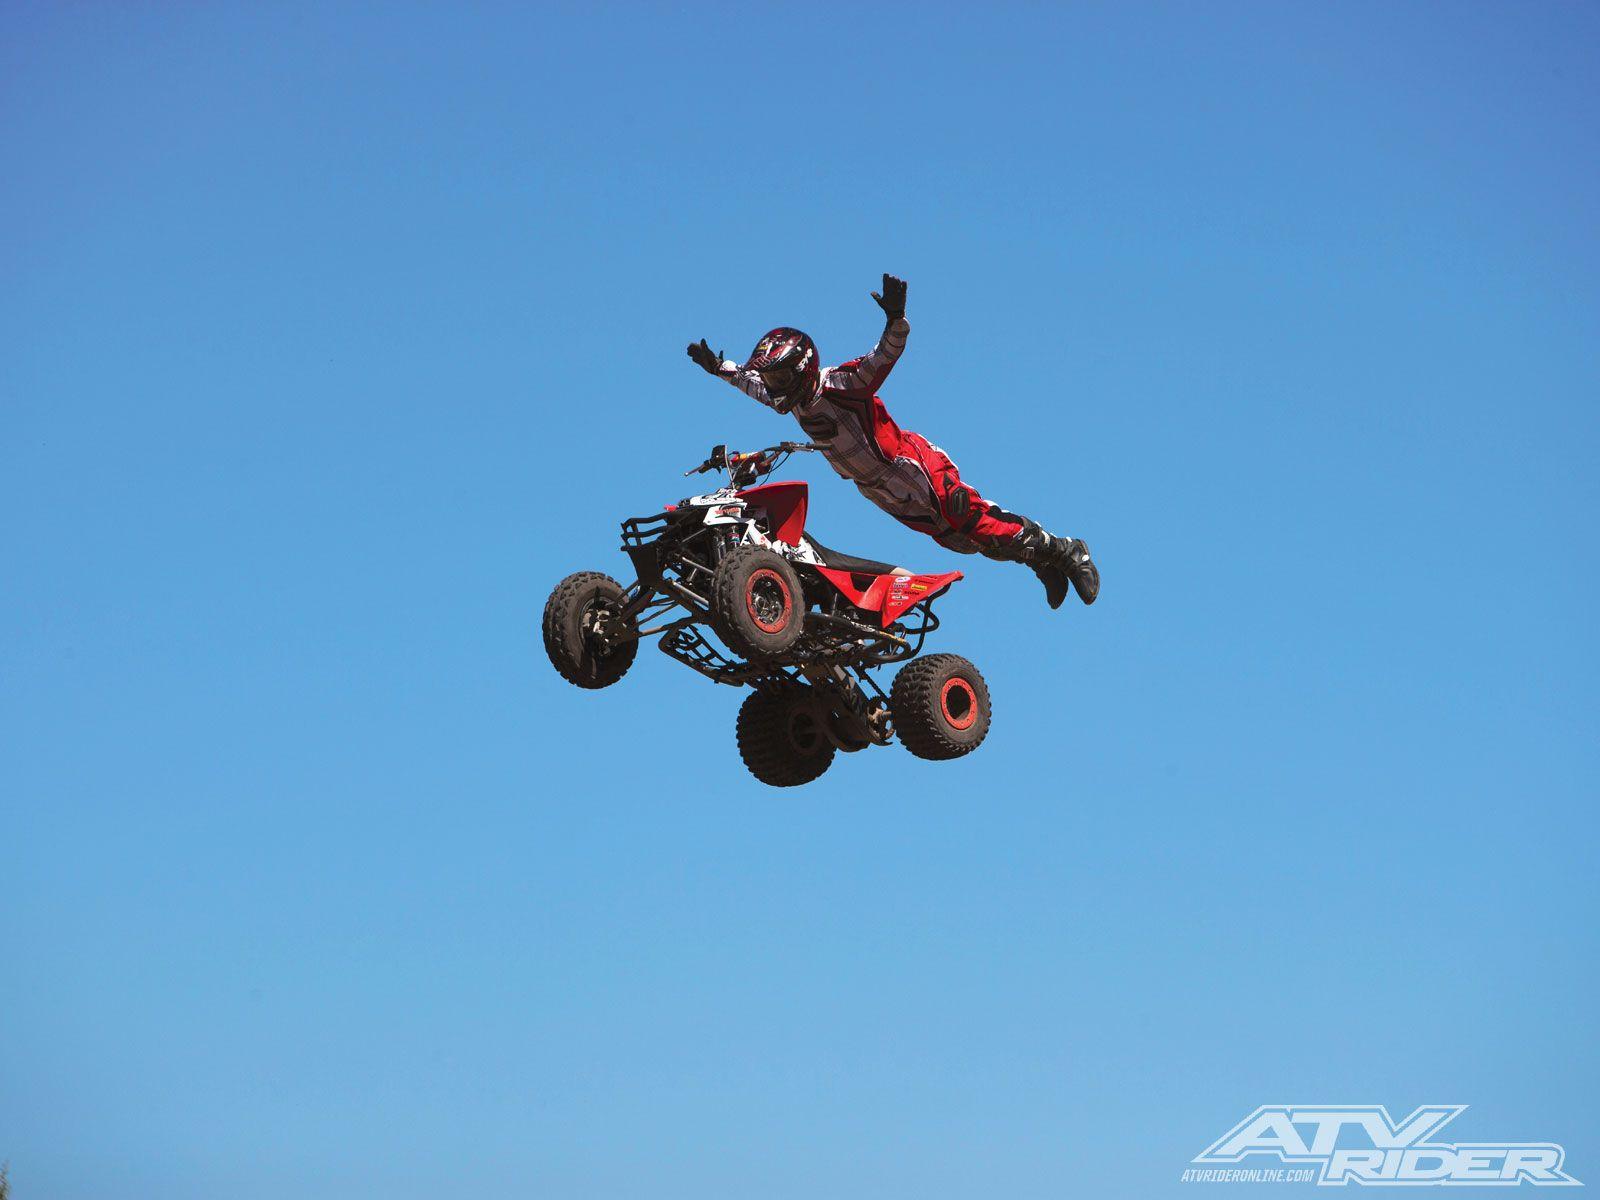 Atv Jumping Atv Motocross Atv Quads Yamaha Raptor 700